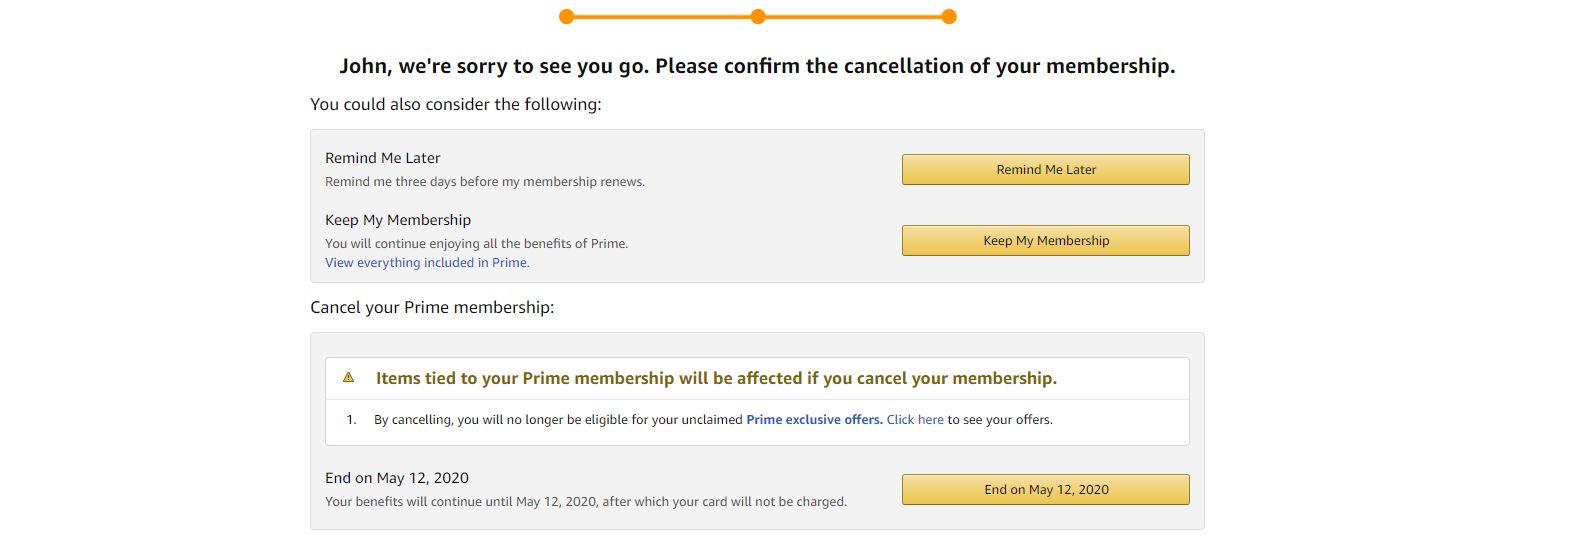 amazon prime cancel membership screen 3